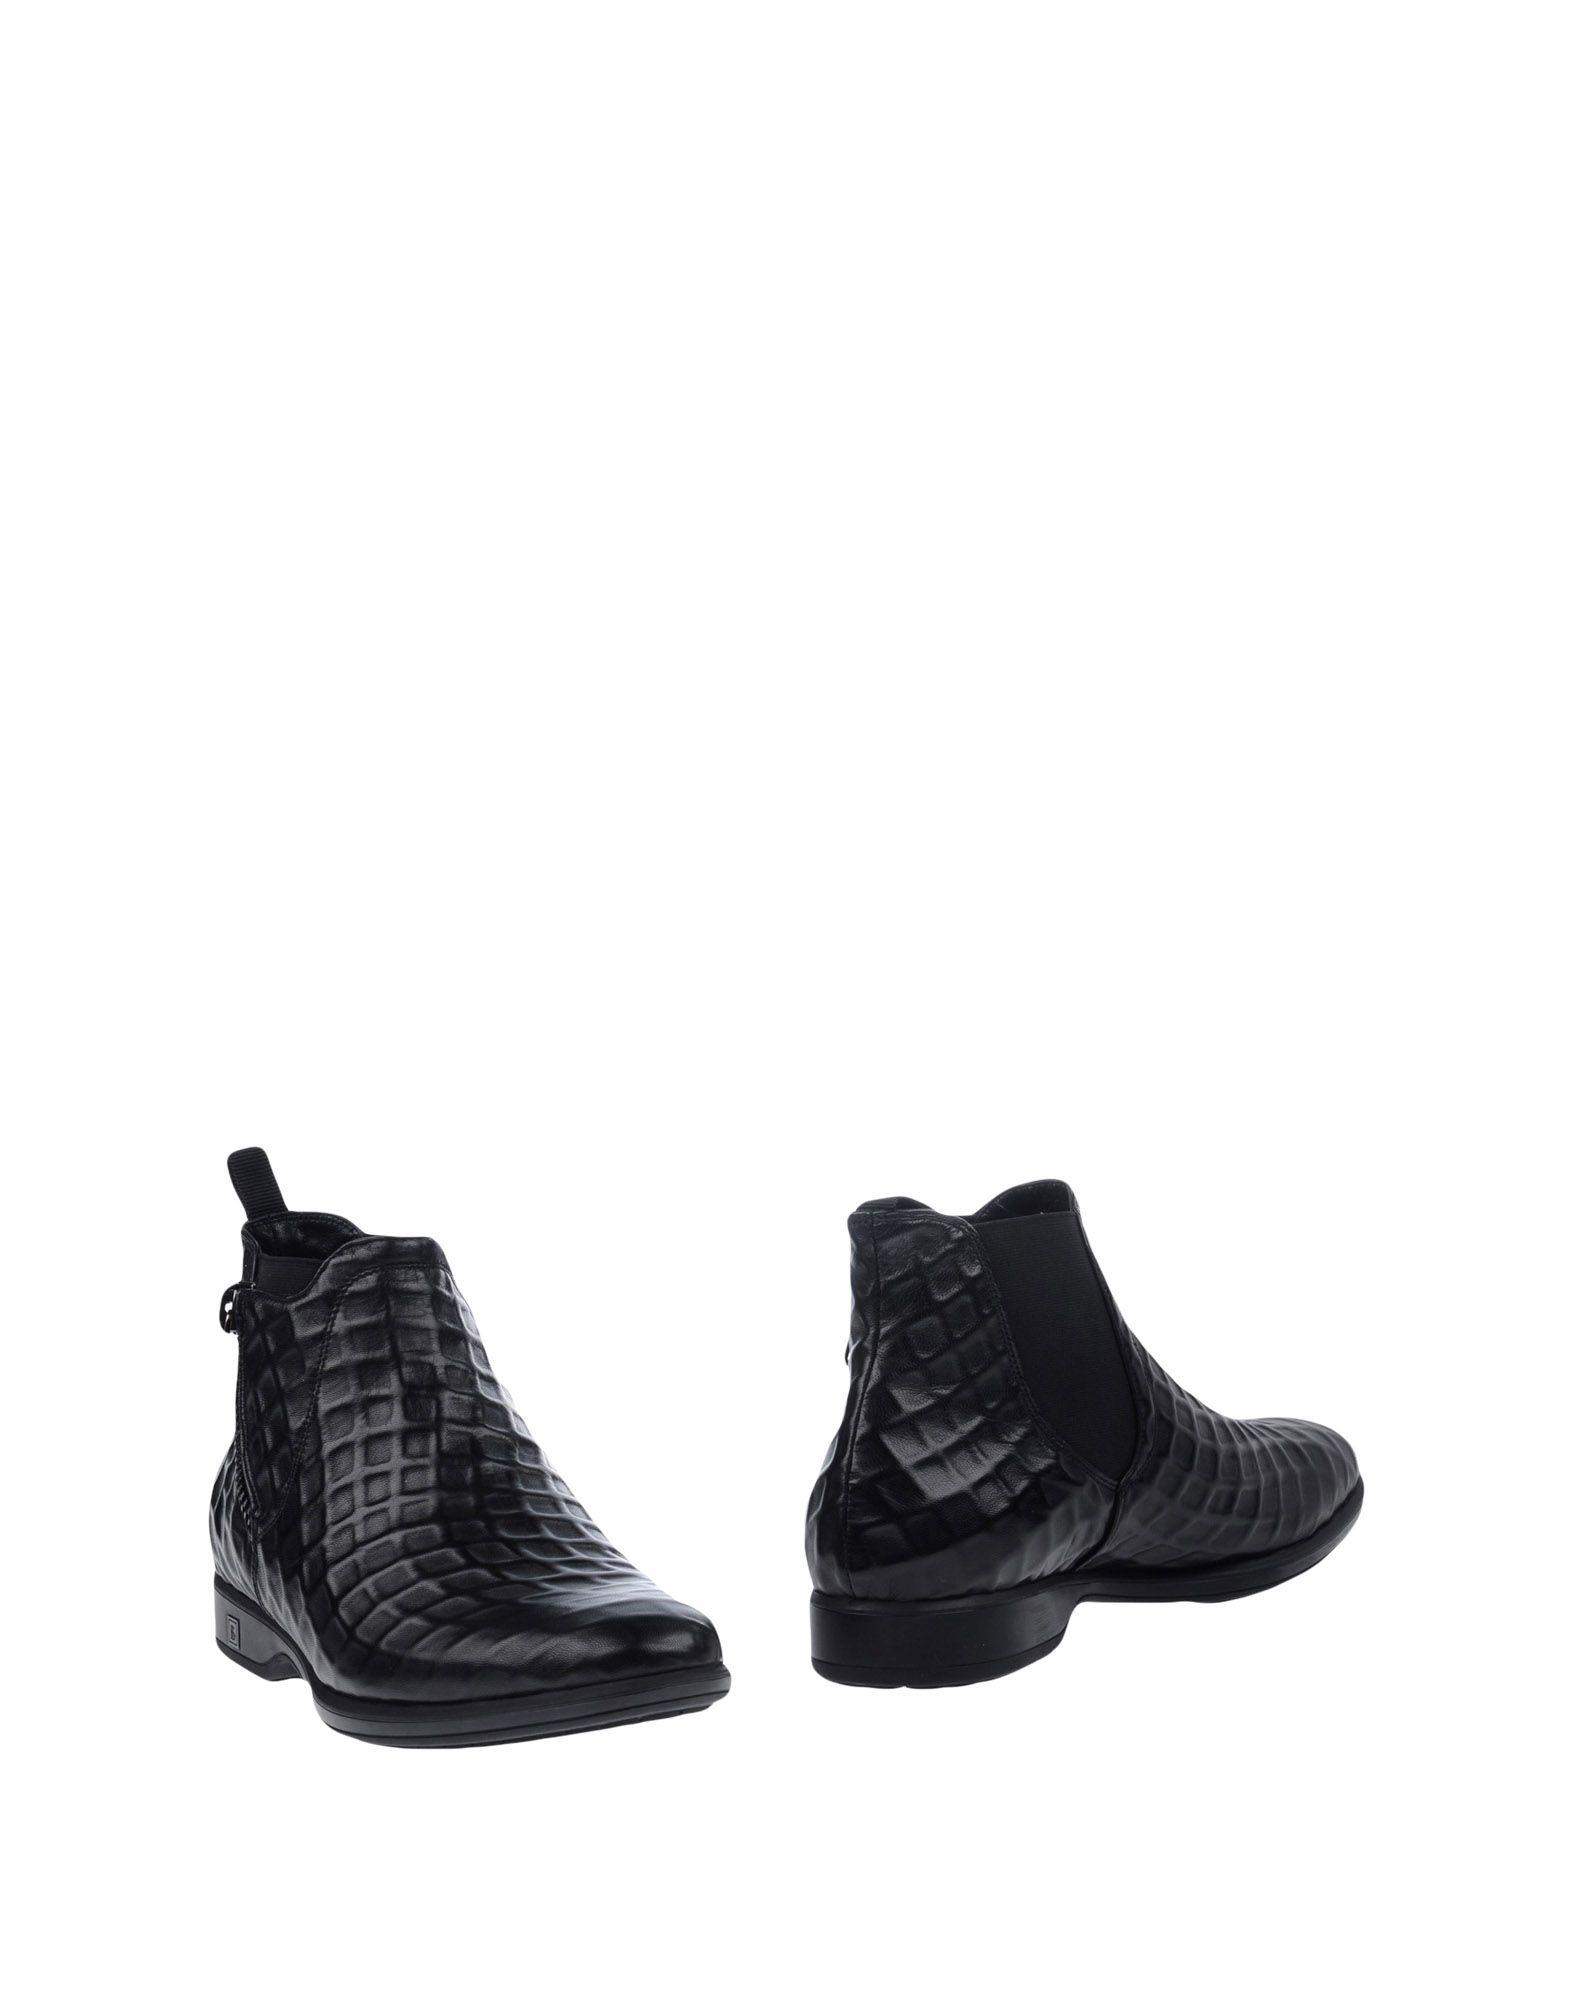 ROBERTO BOTTICELLI Полусапоги и высокие ботинки roberto botticelli полусапоги и высокие ботинки